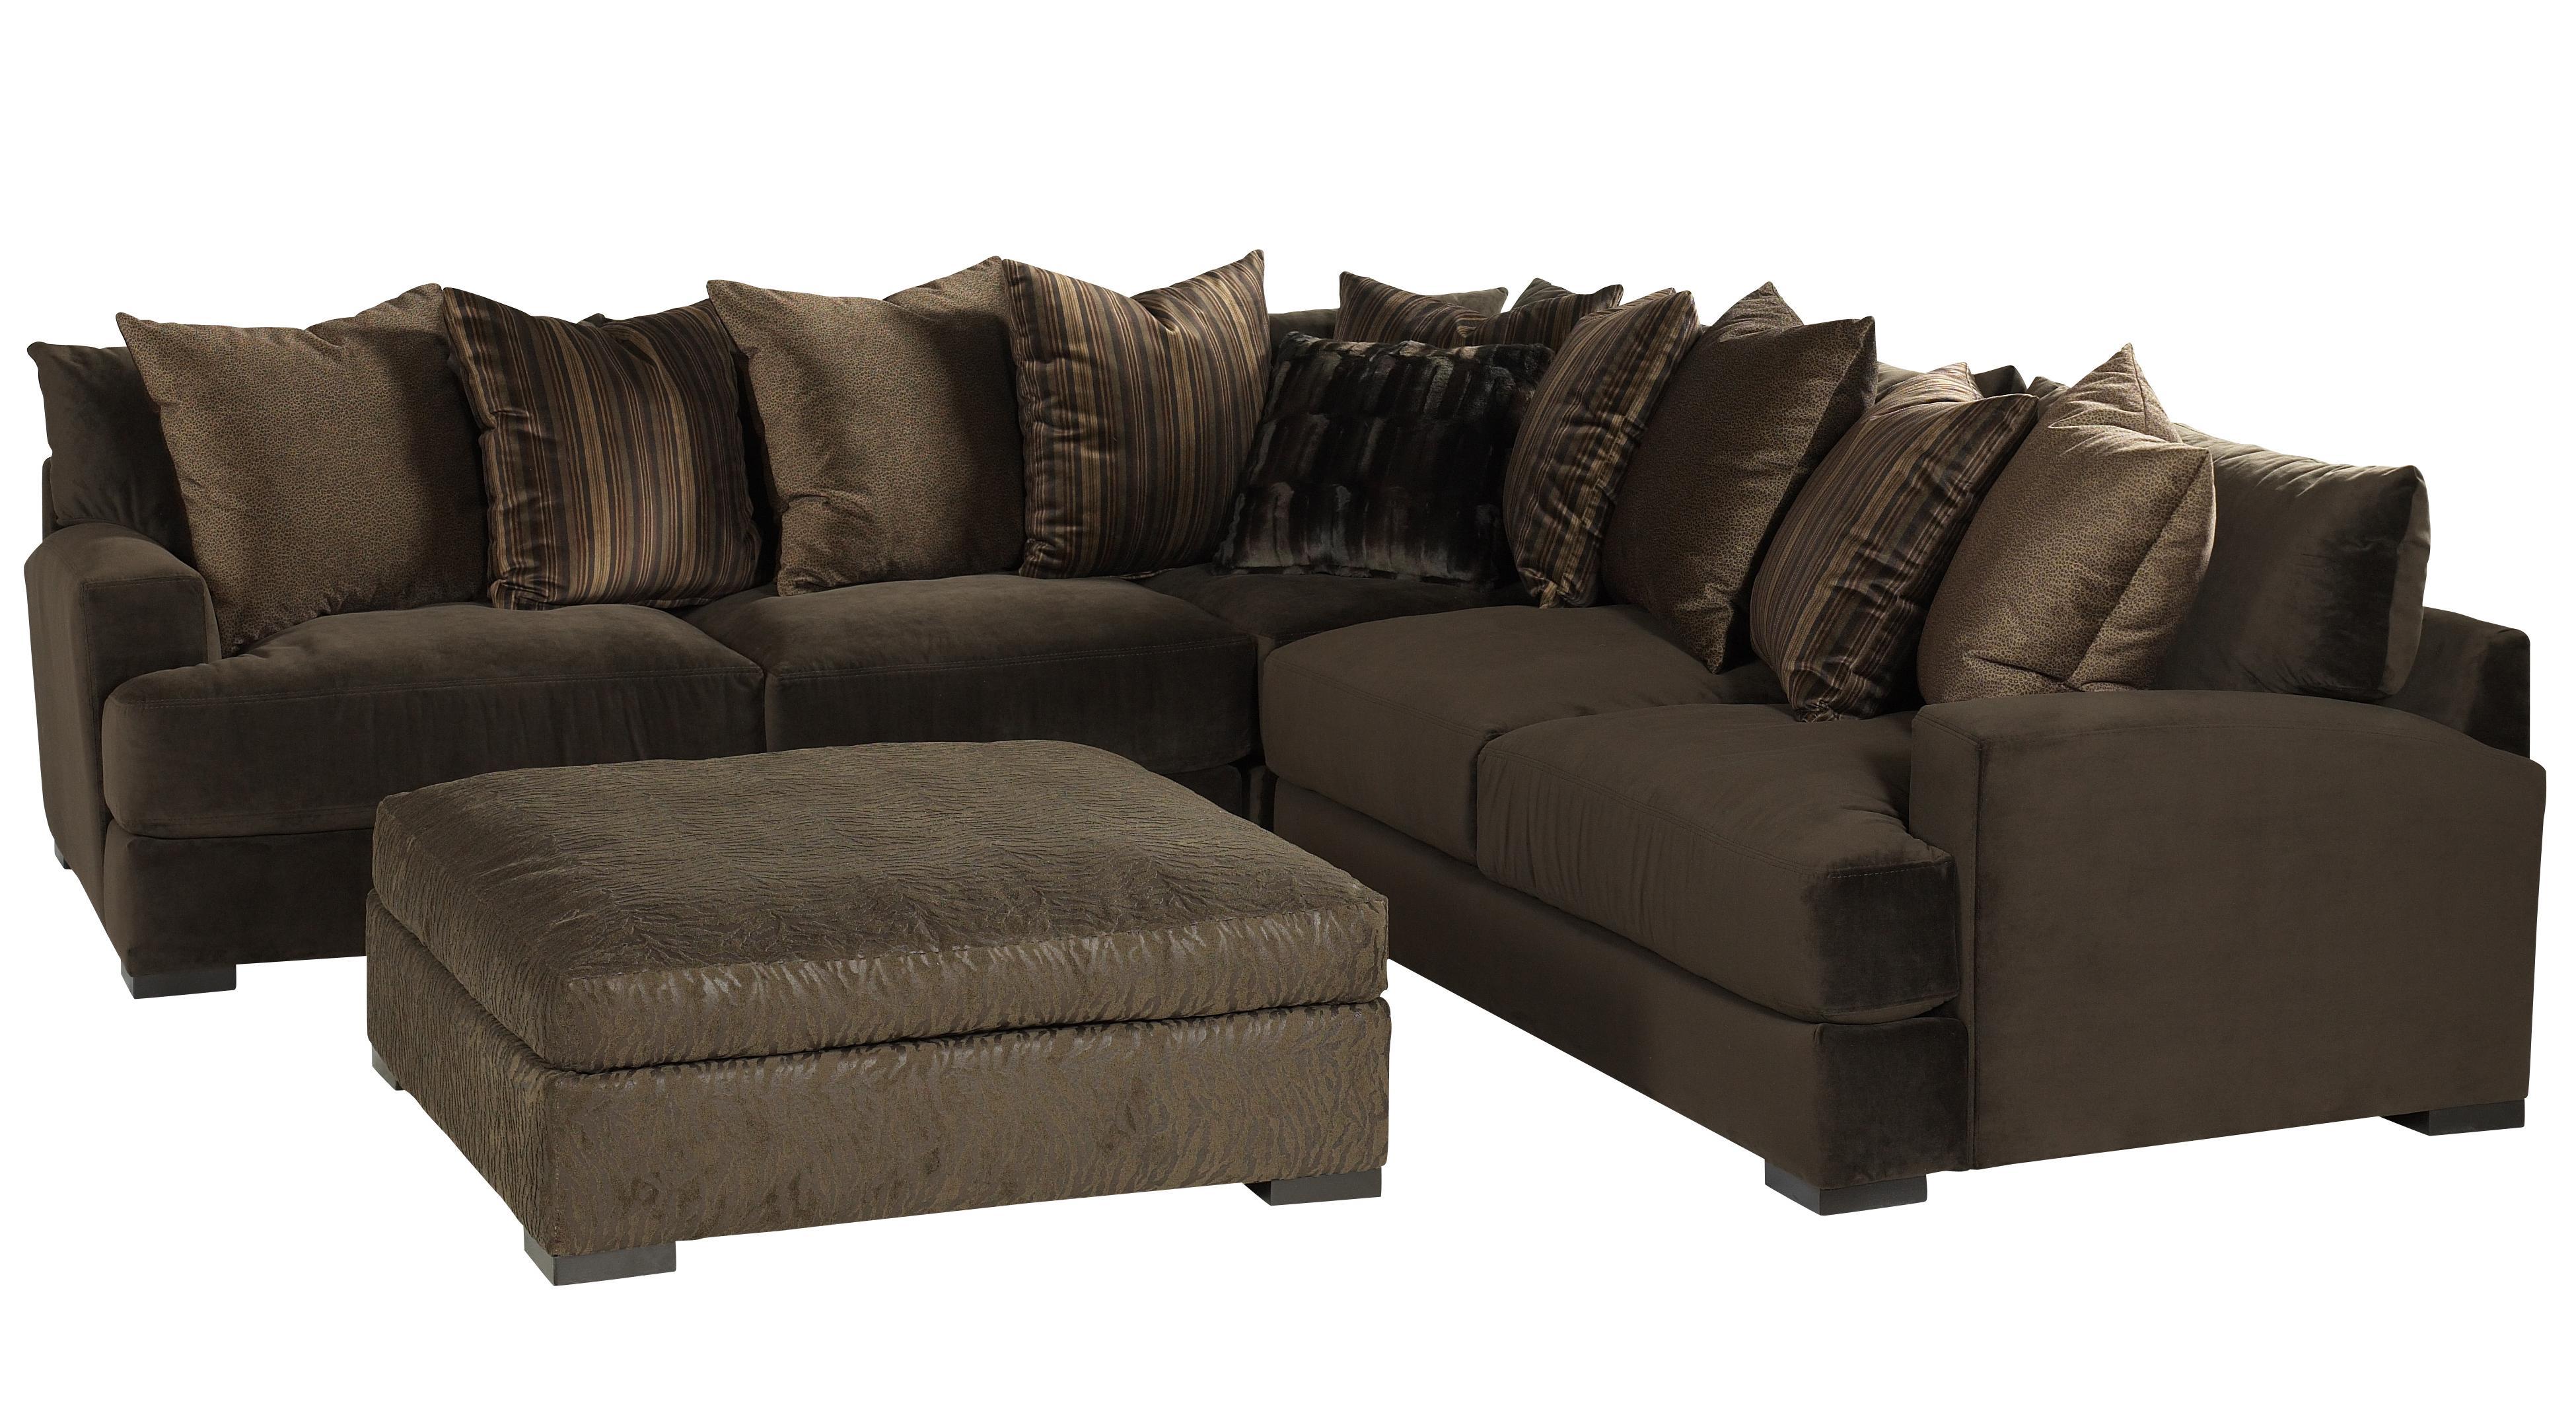 Carlin Stationary Sofa Sectional by Jonathan Louis at Stoney Creek Furniture